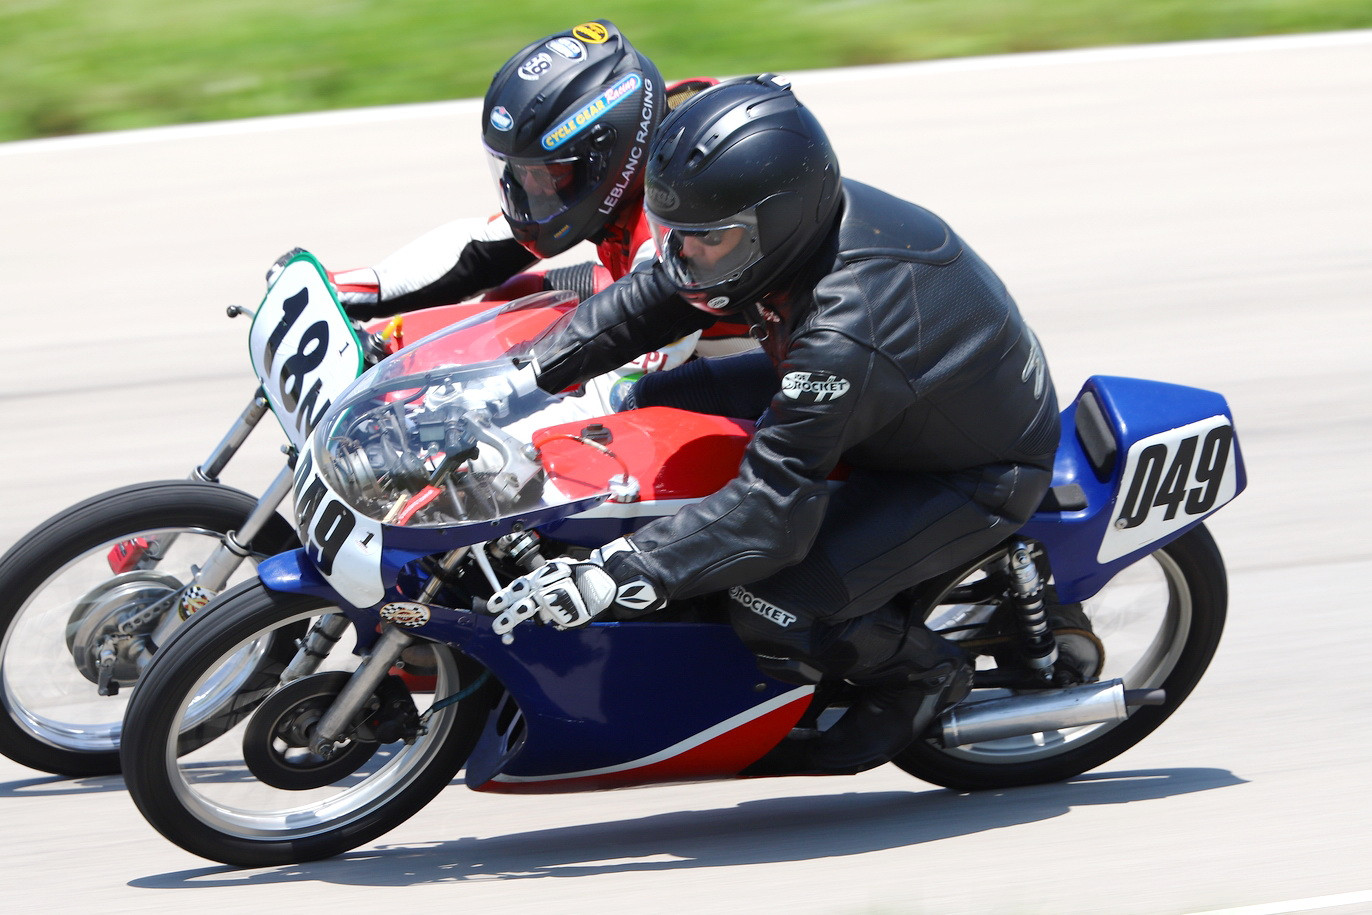 AHRMA racers Danny Habermel (049) and Louis LeBlanc (18N) in action. Photo by etechphoto.com, courtesy AHRMA.